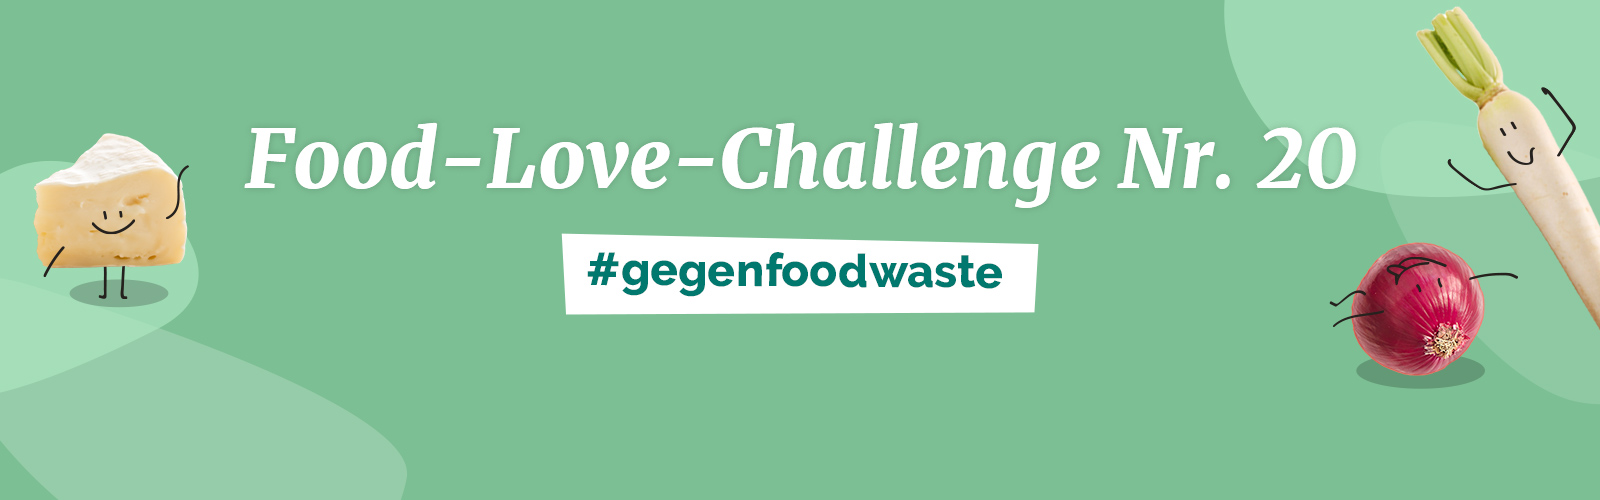 Food Love Challenge Nr. 20